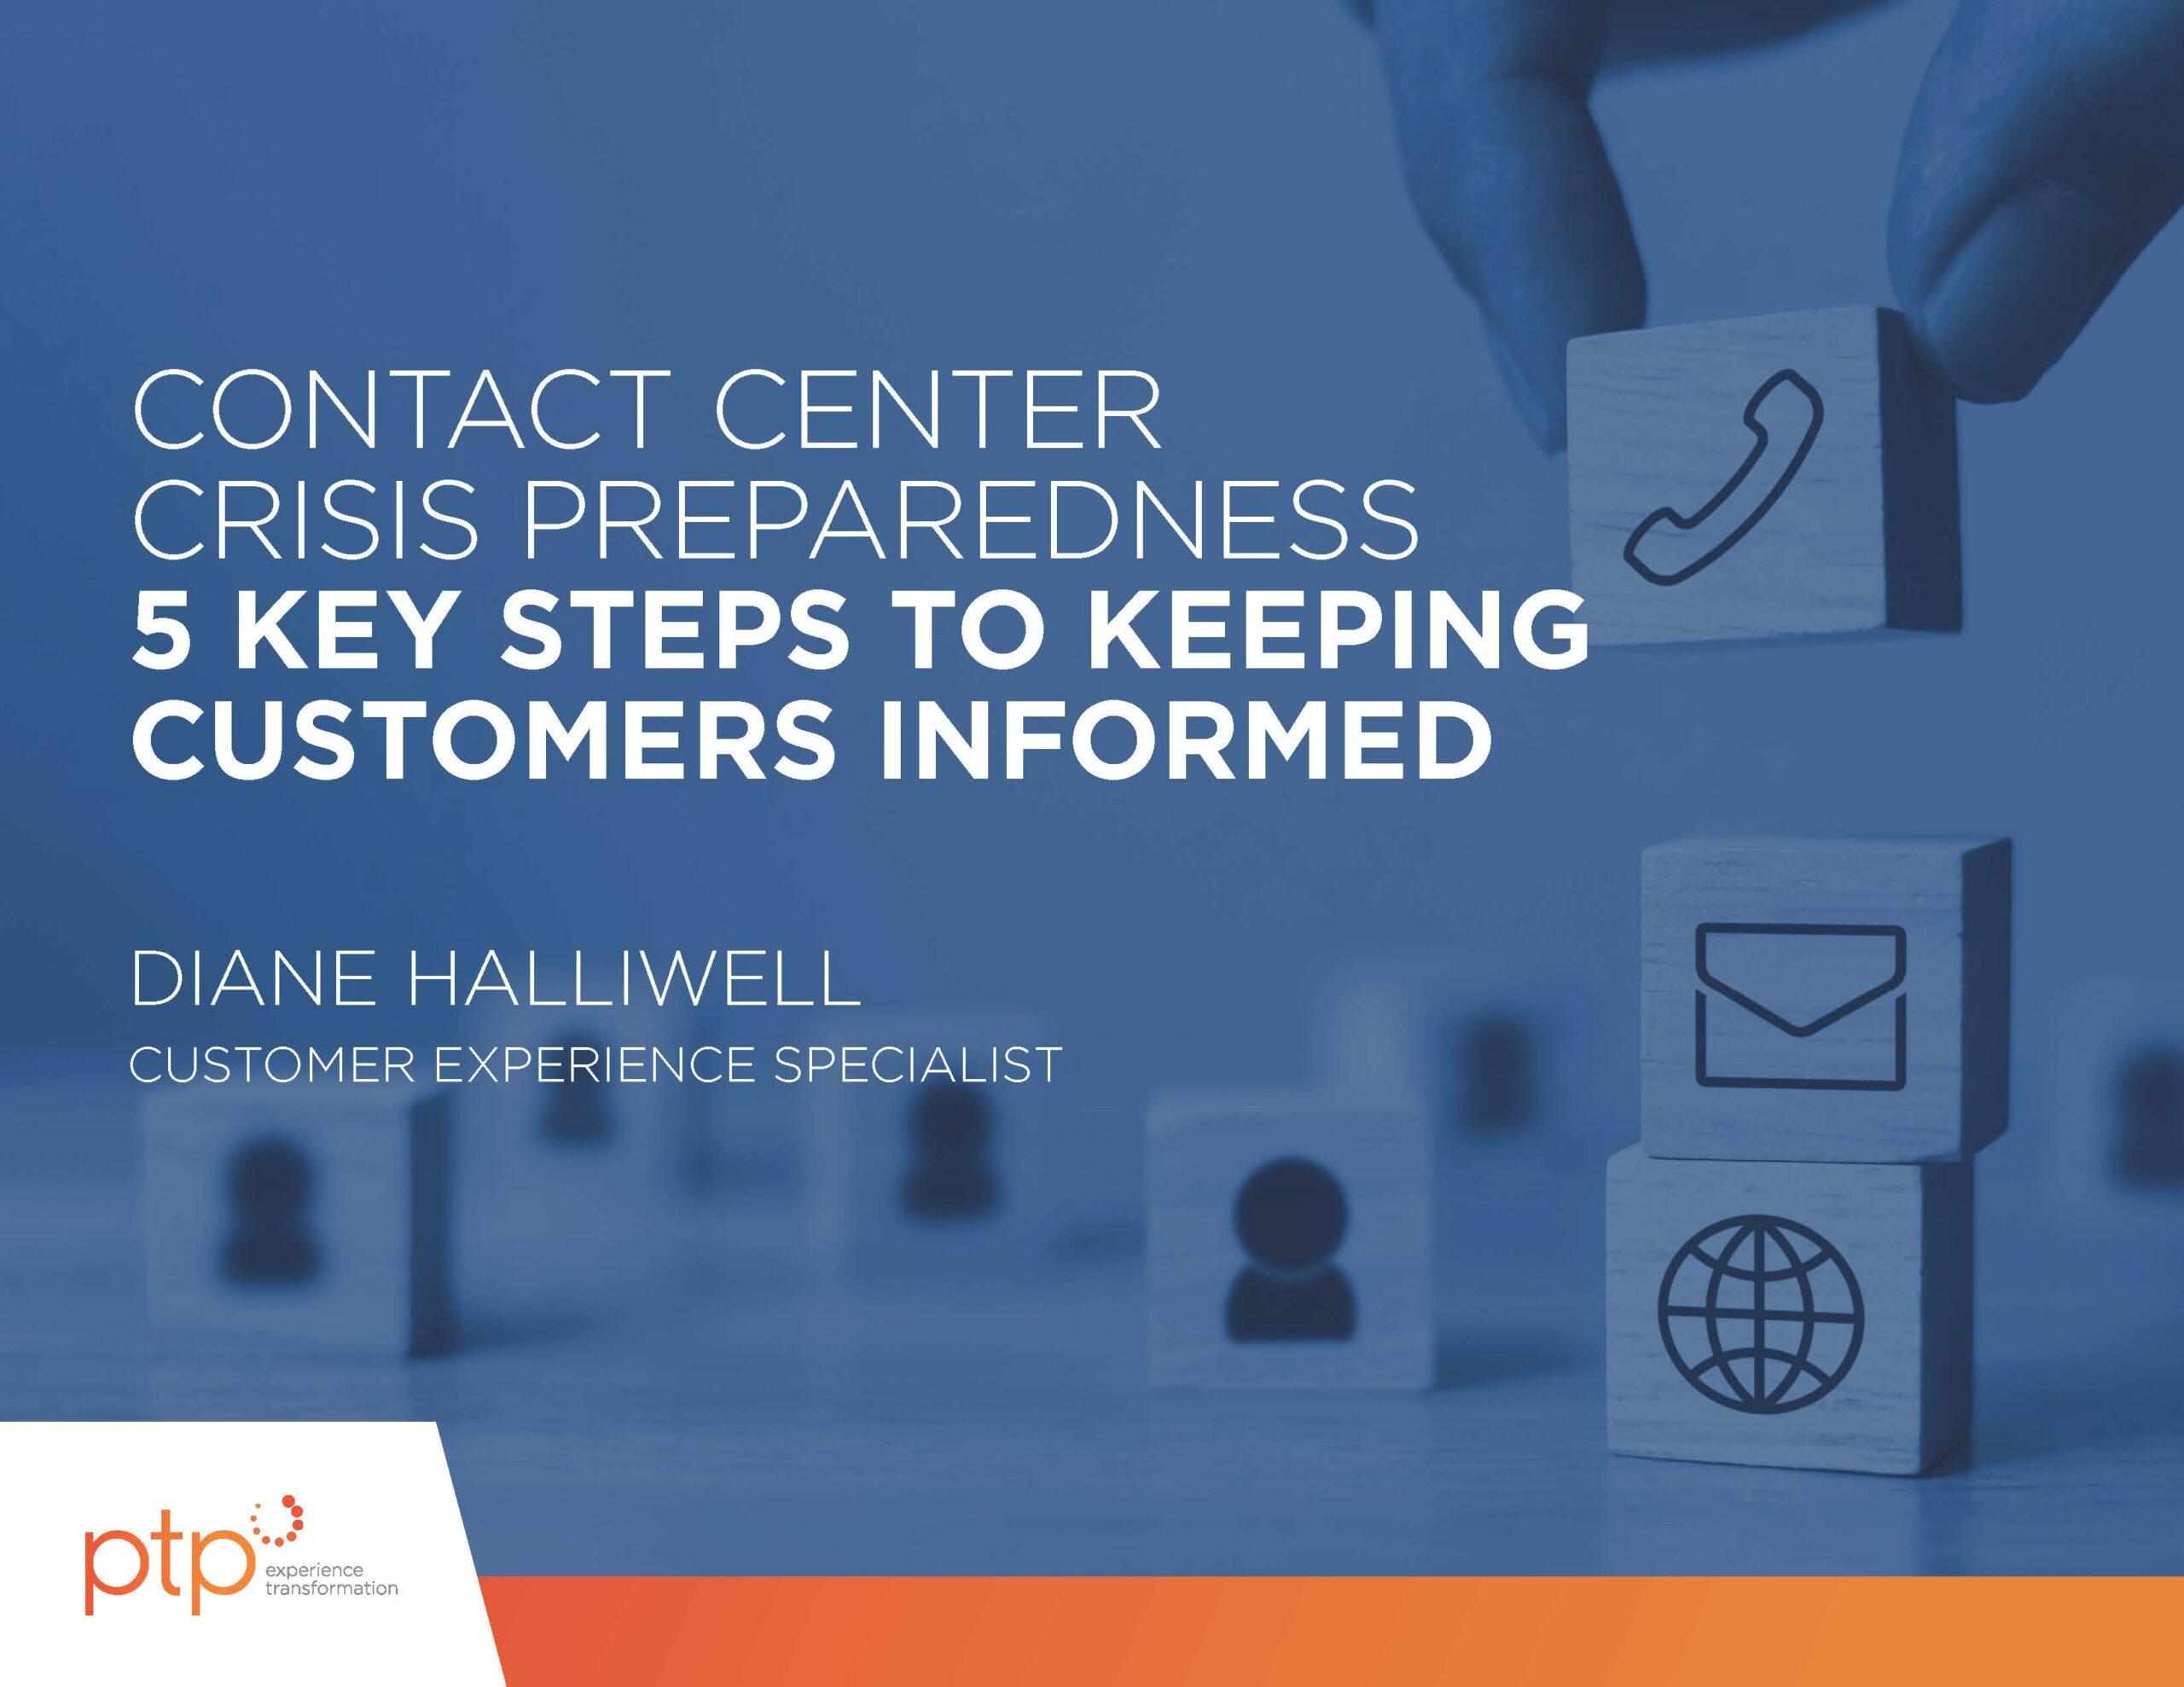 Contact Center Preparedness eBook